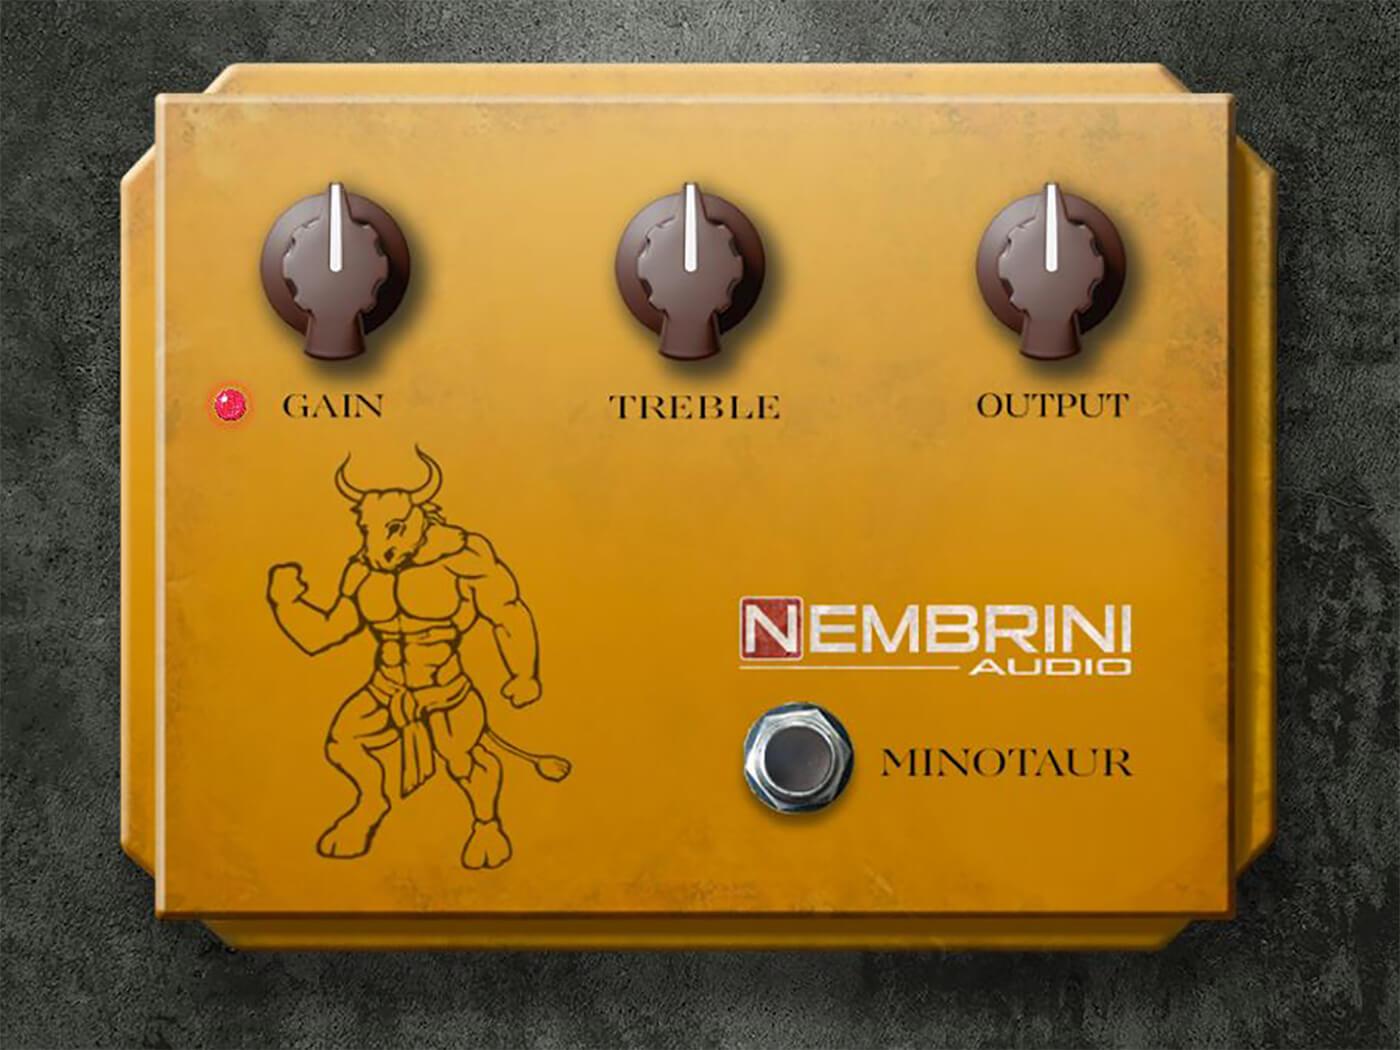 Nembrini Audio Klon Minotaur Ovredrive